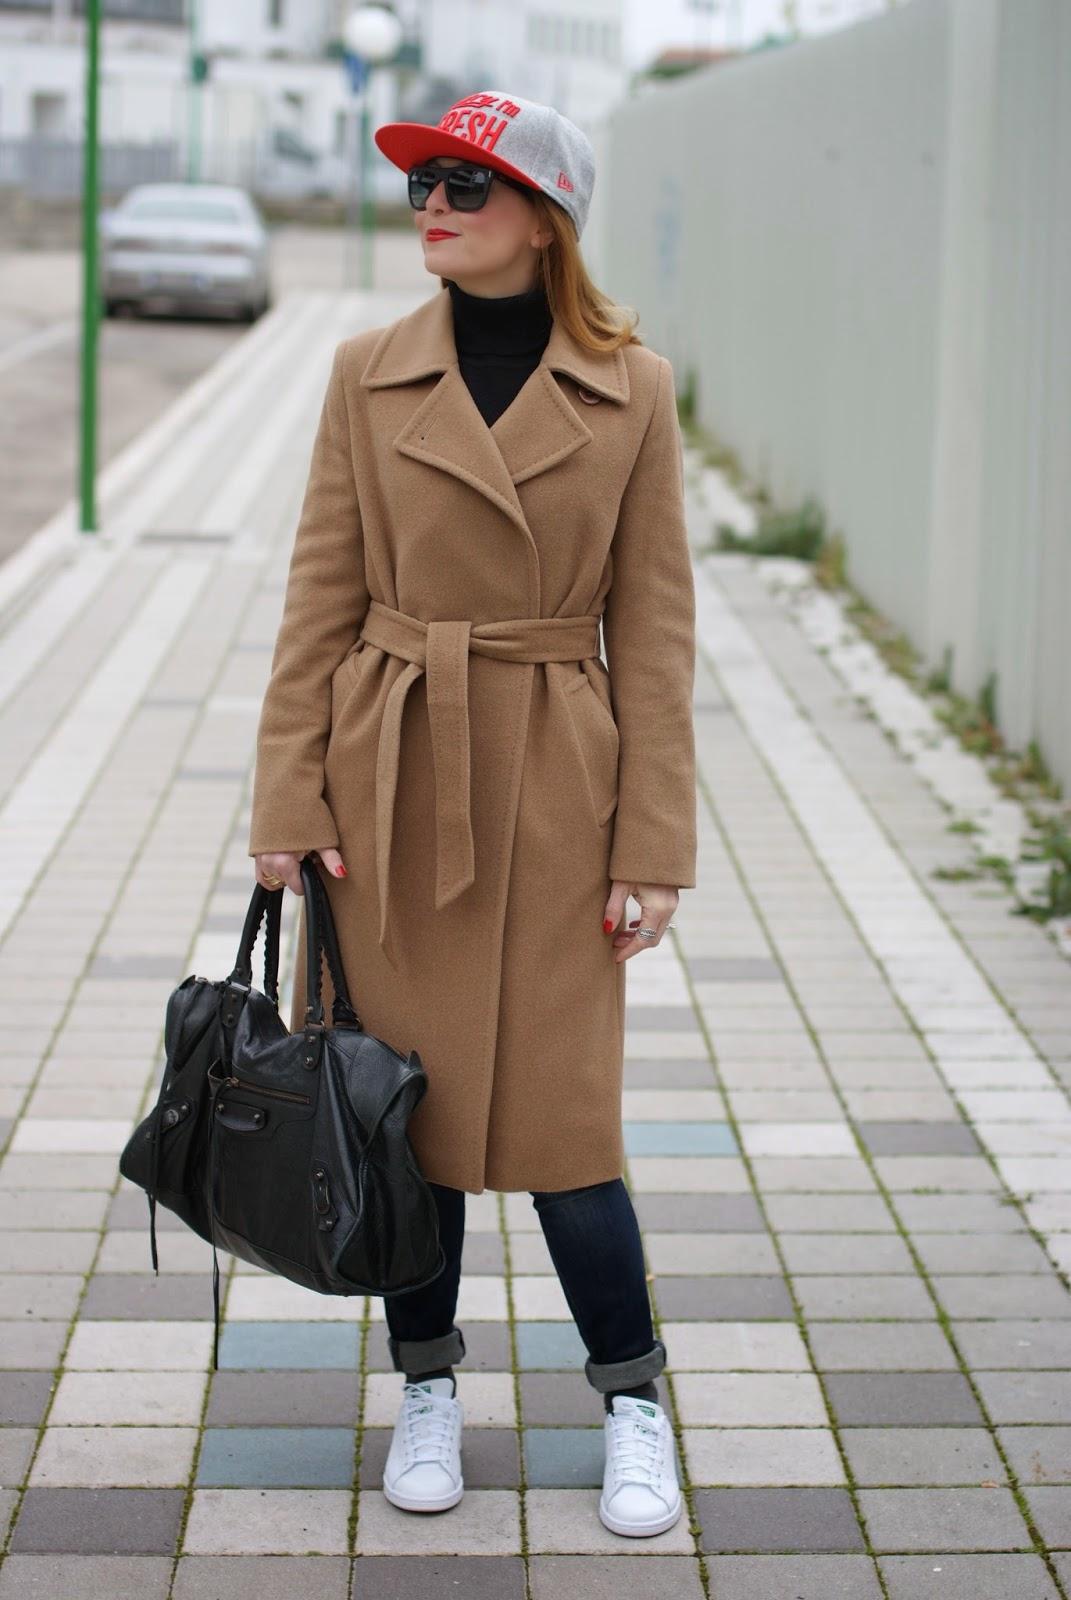 Max Mara camel coat worn with Adidas Stan Smith and Balenciaga Work bag on Fashion and Cookies fashion blog, fashion blogger italiana